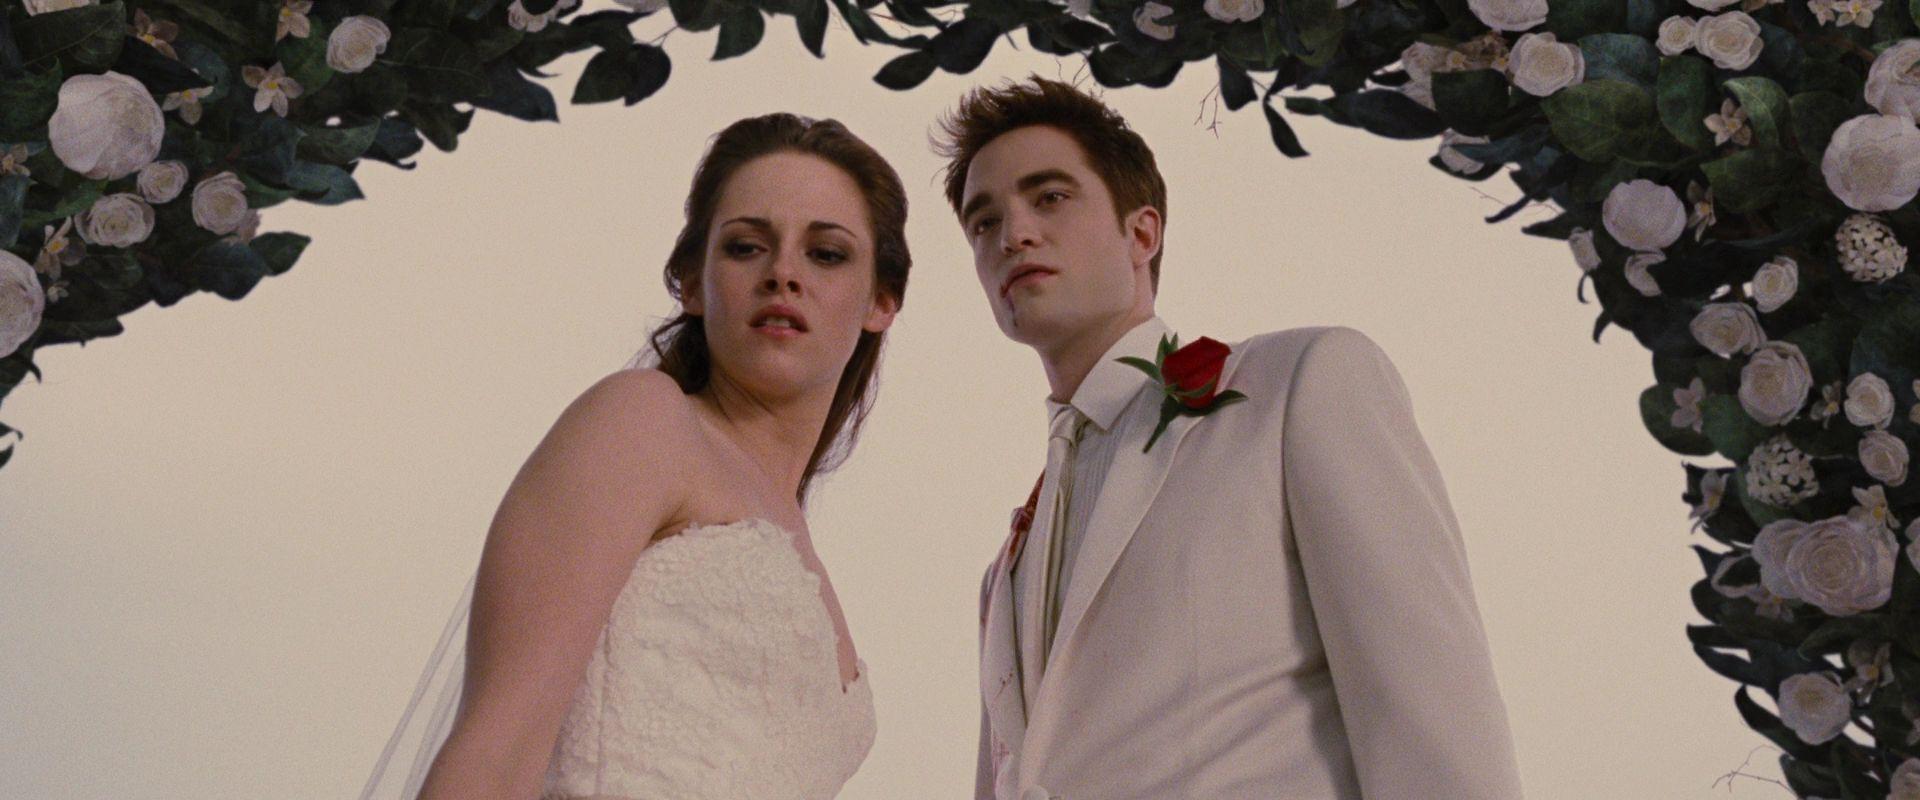 4c4779b9536 Dream Wedding Dress vs. Real Wedding Dress - Bella Swan - Fanpop ...